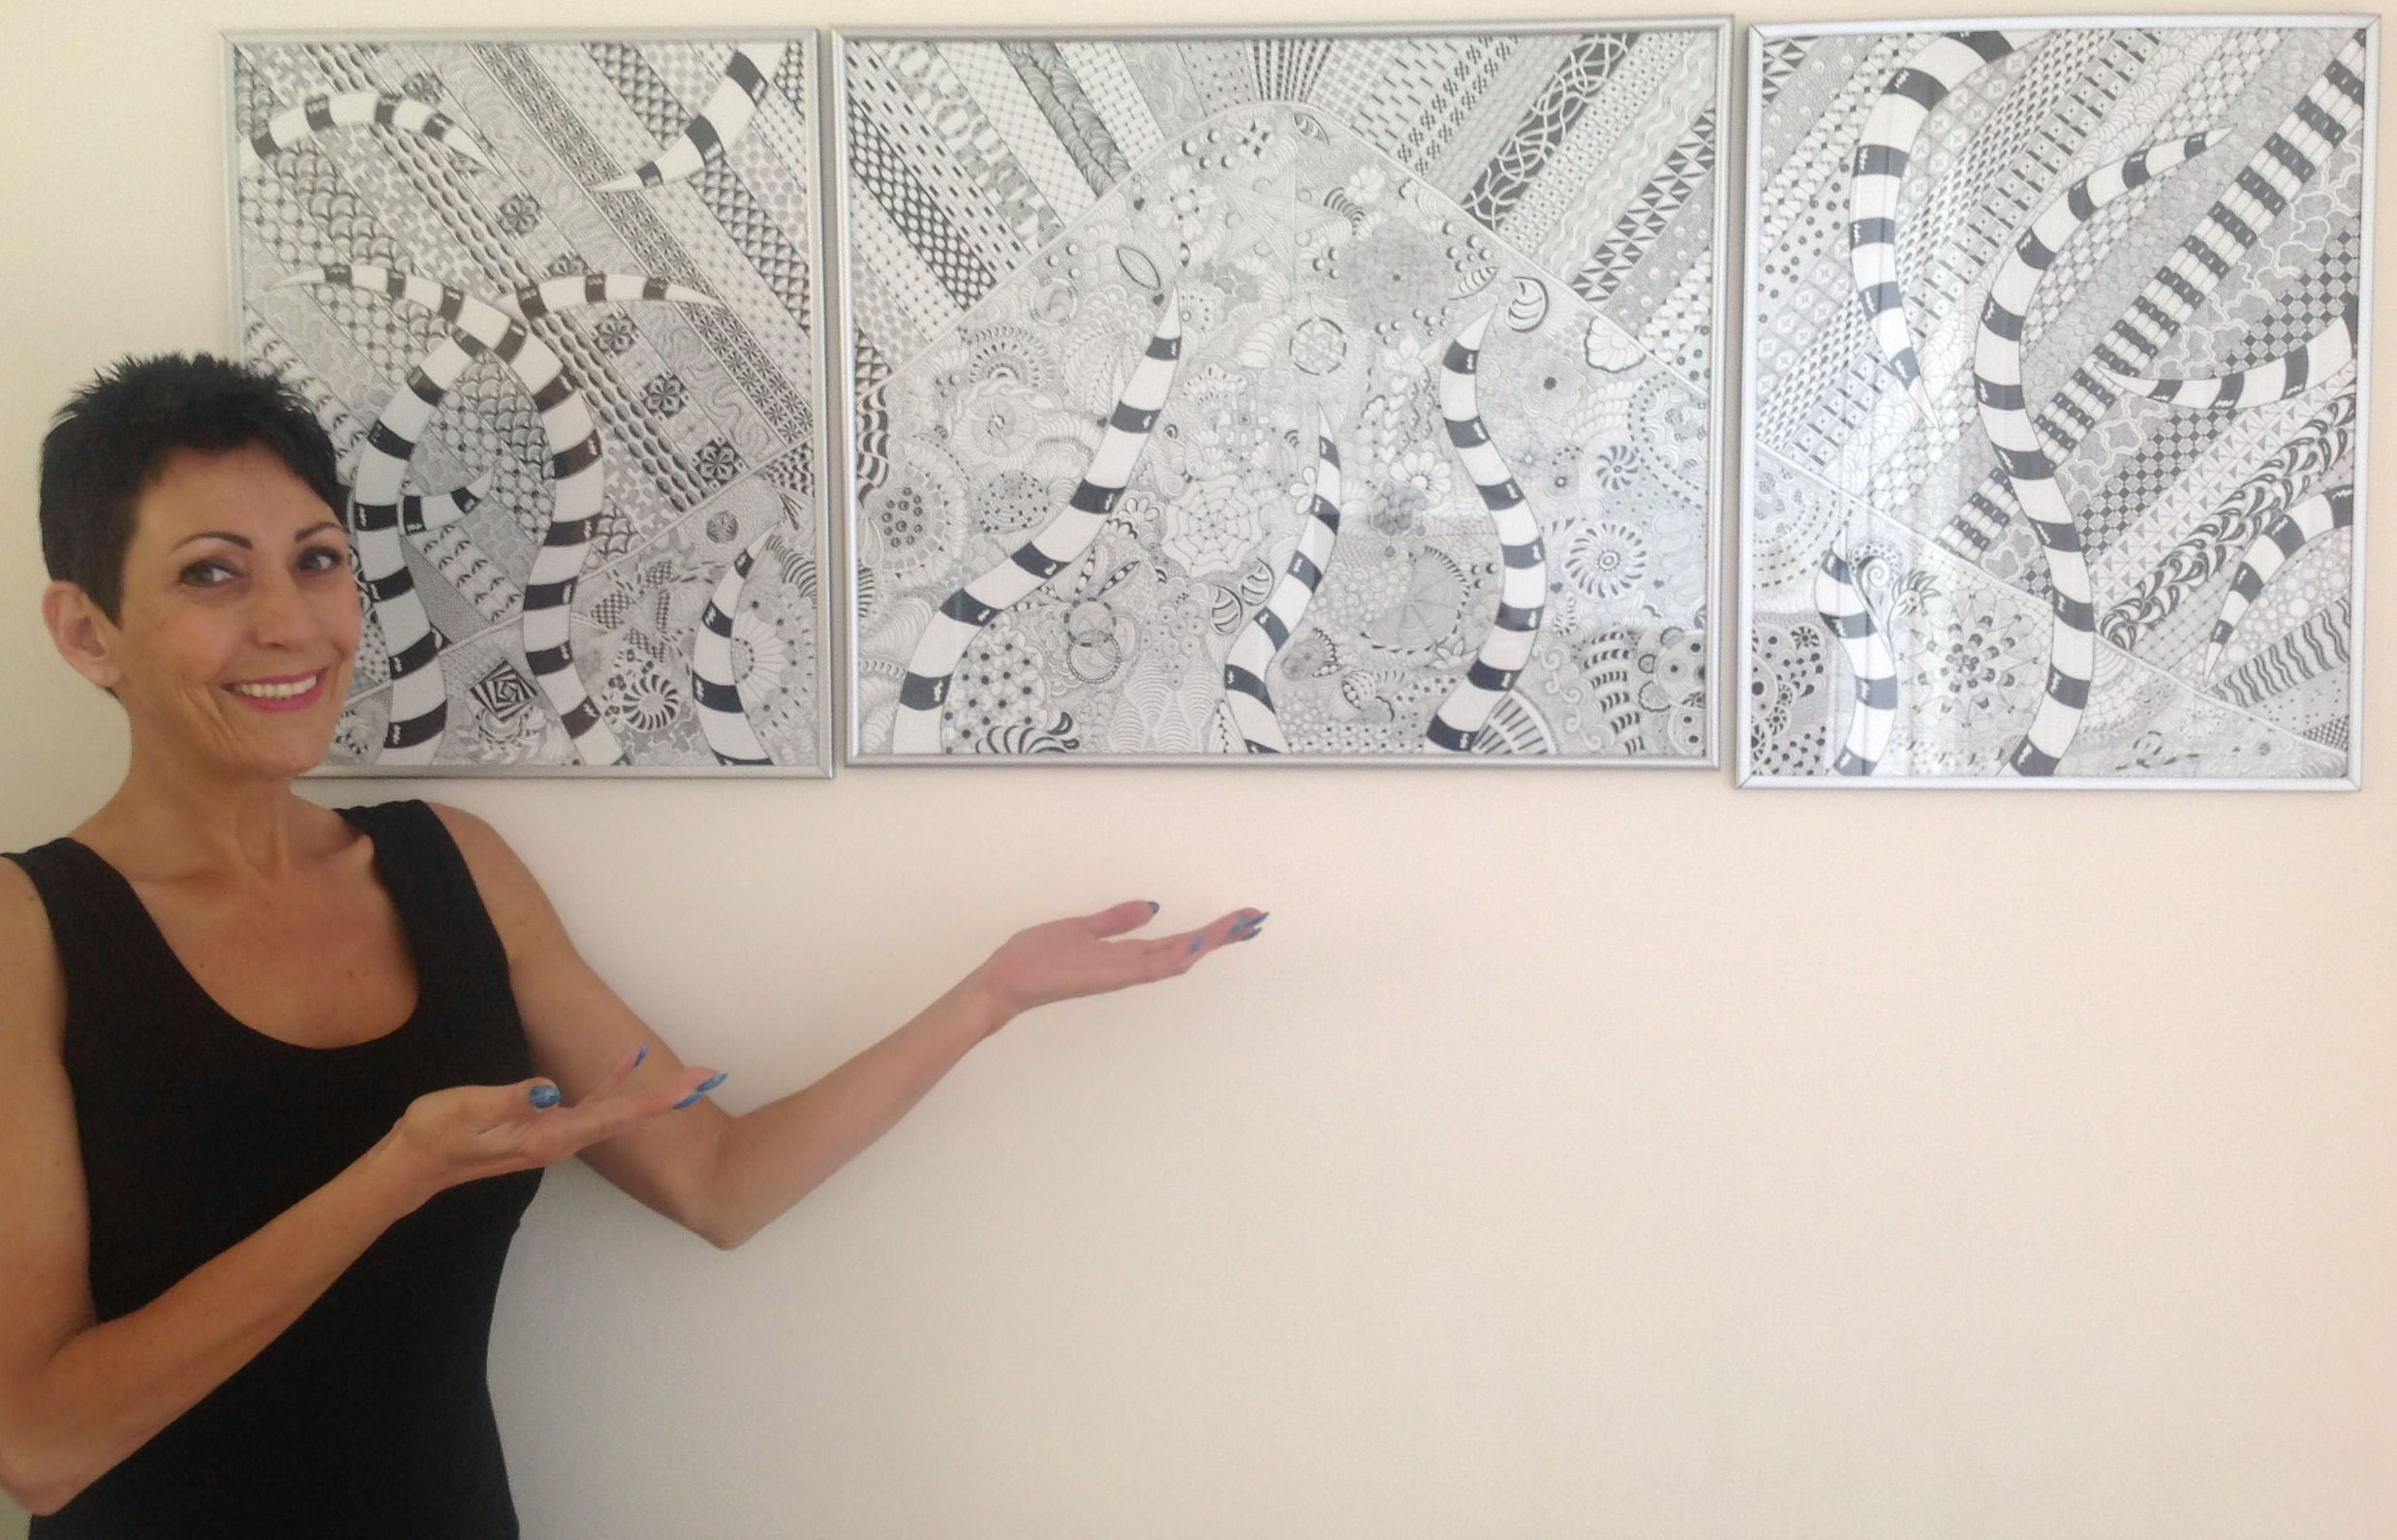 Zentangle made by Mariska den Boer 155